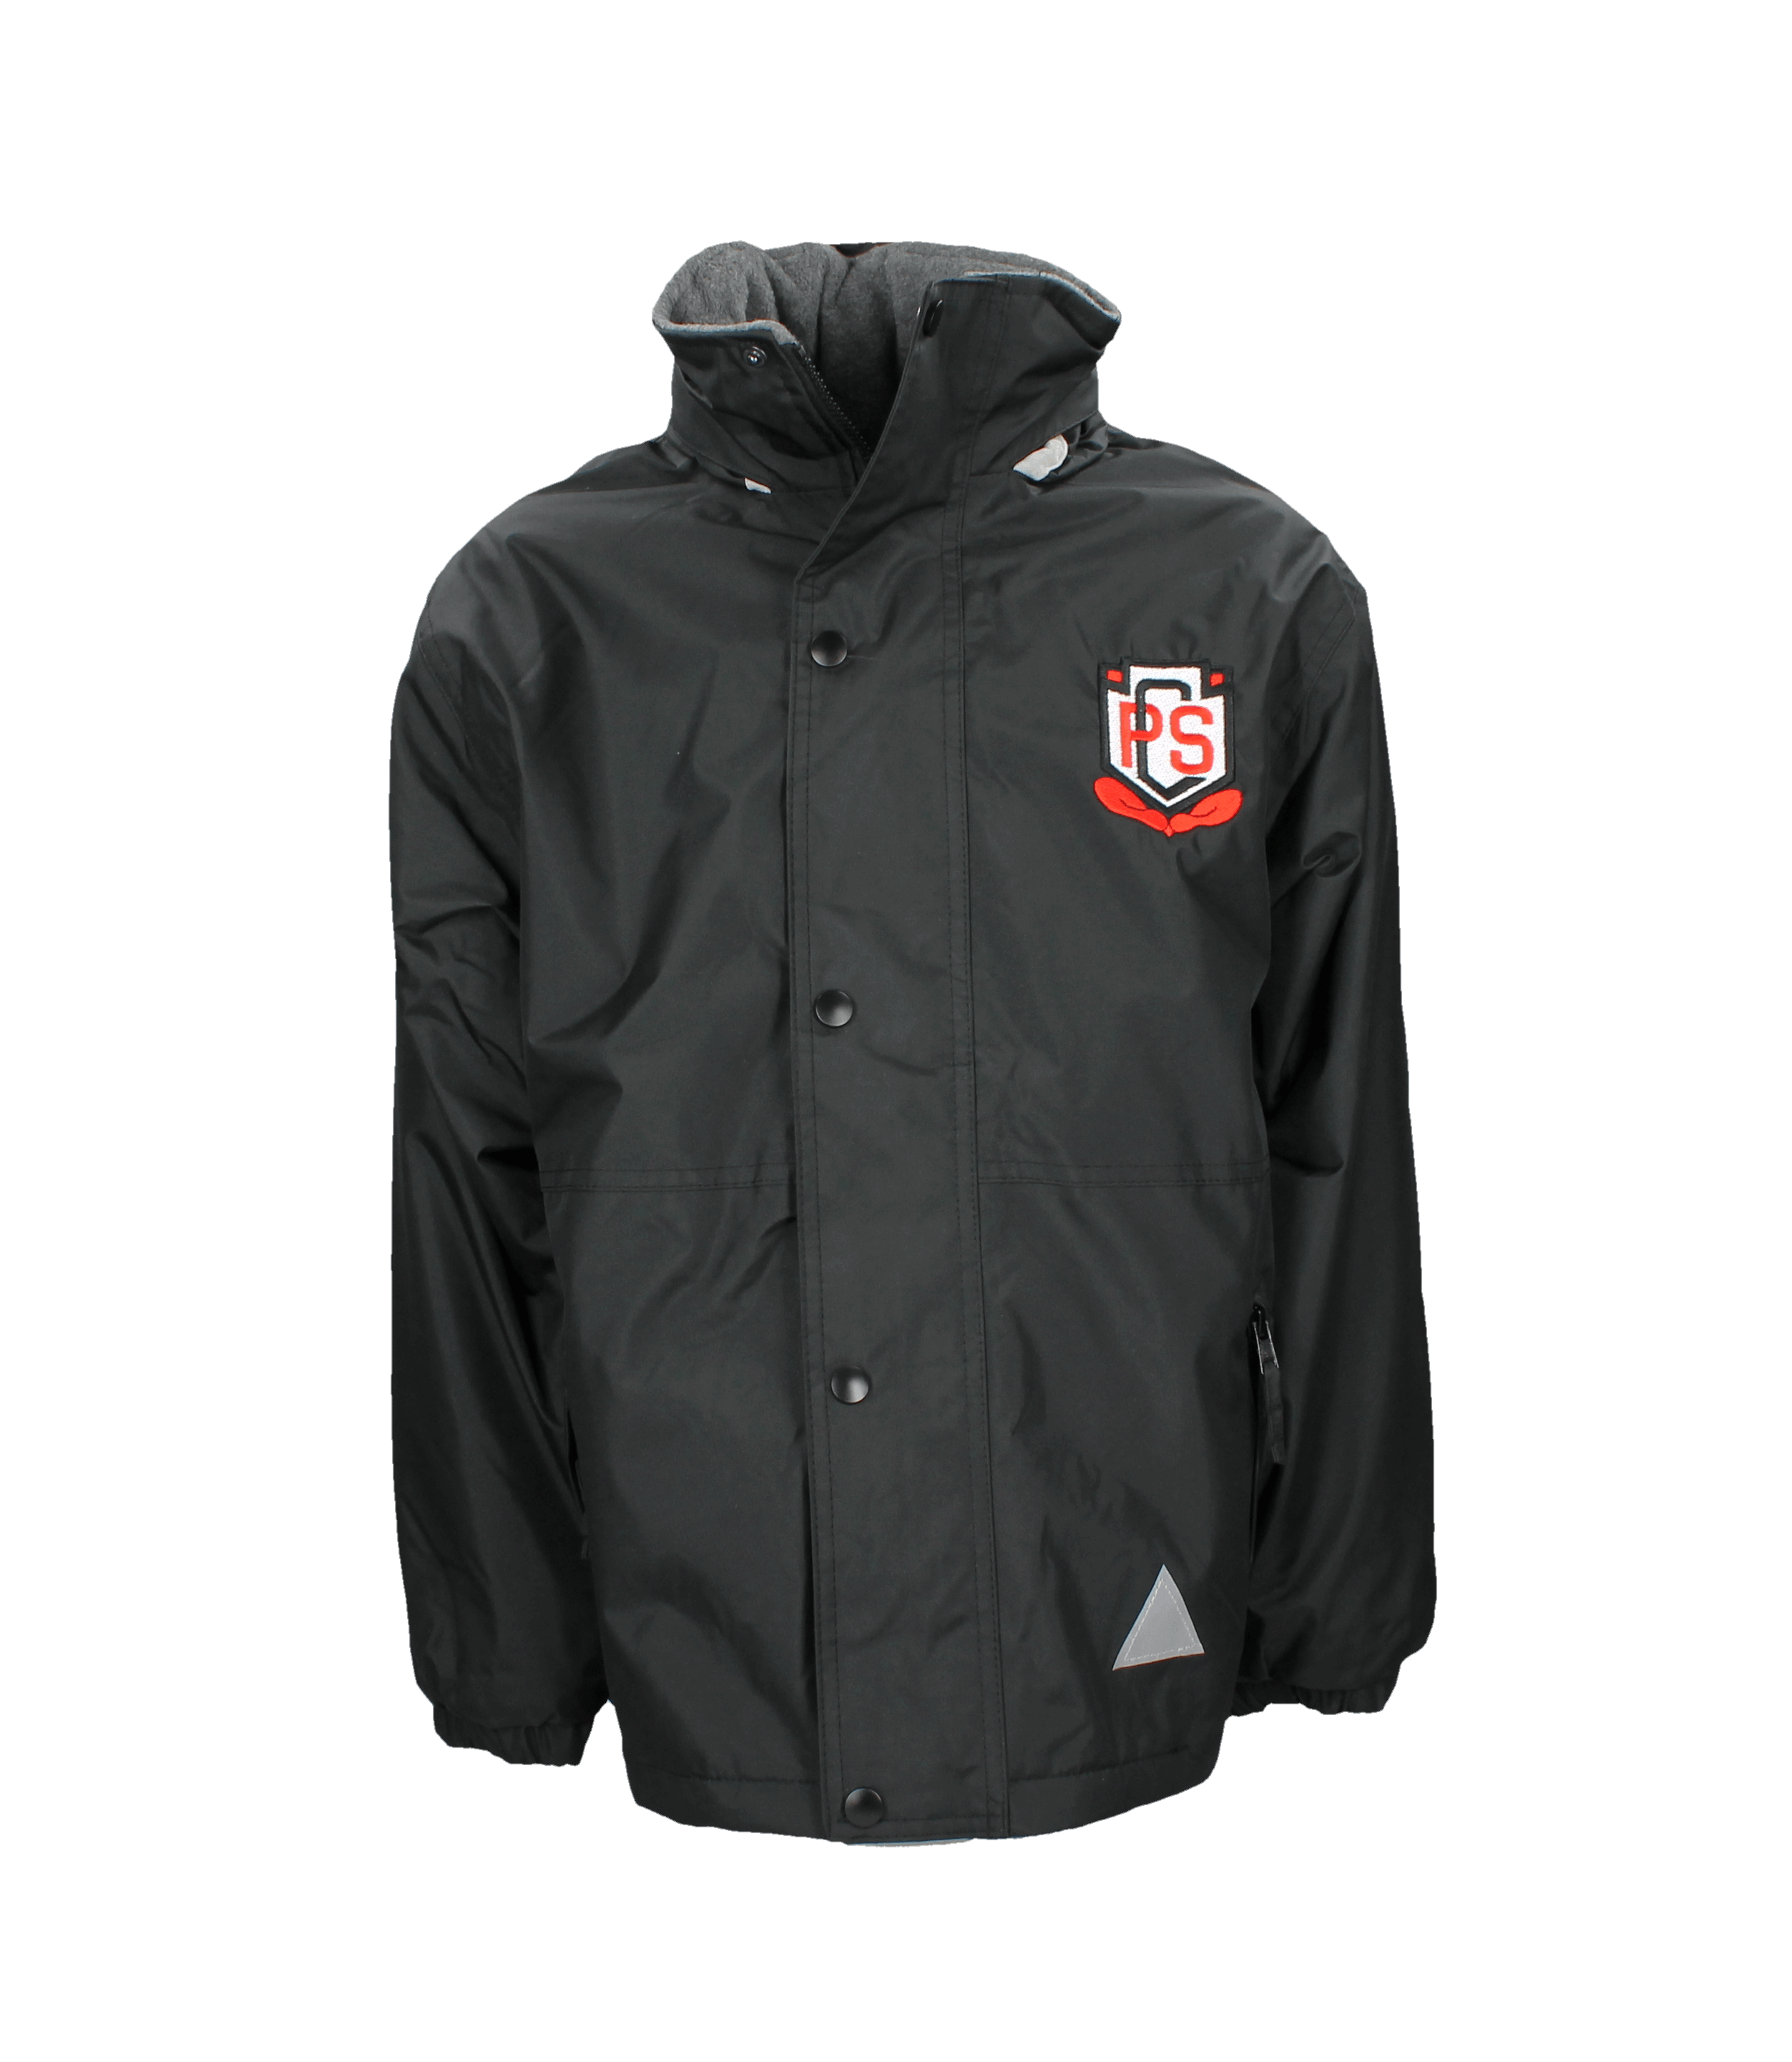 Carolside Reversible Fleece Lined Jacket (Red or Black)